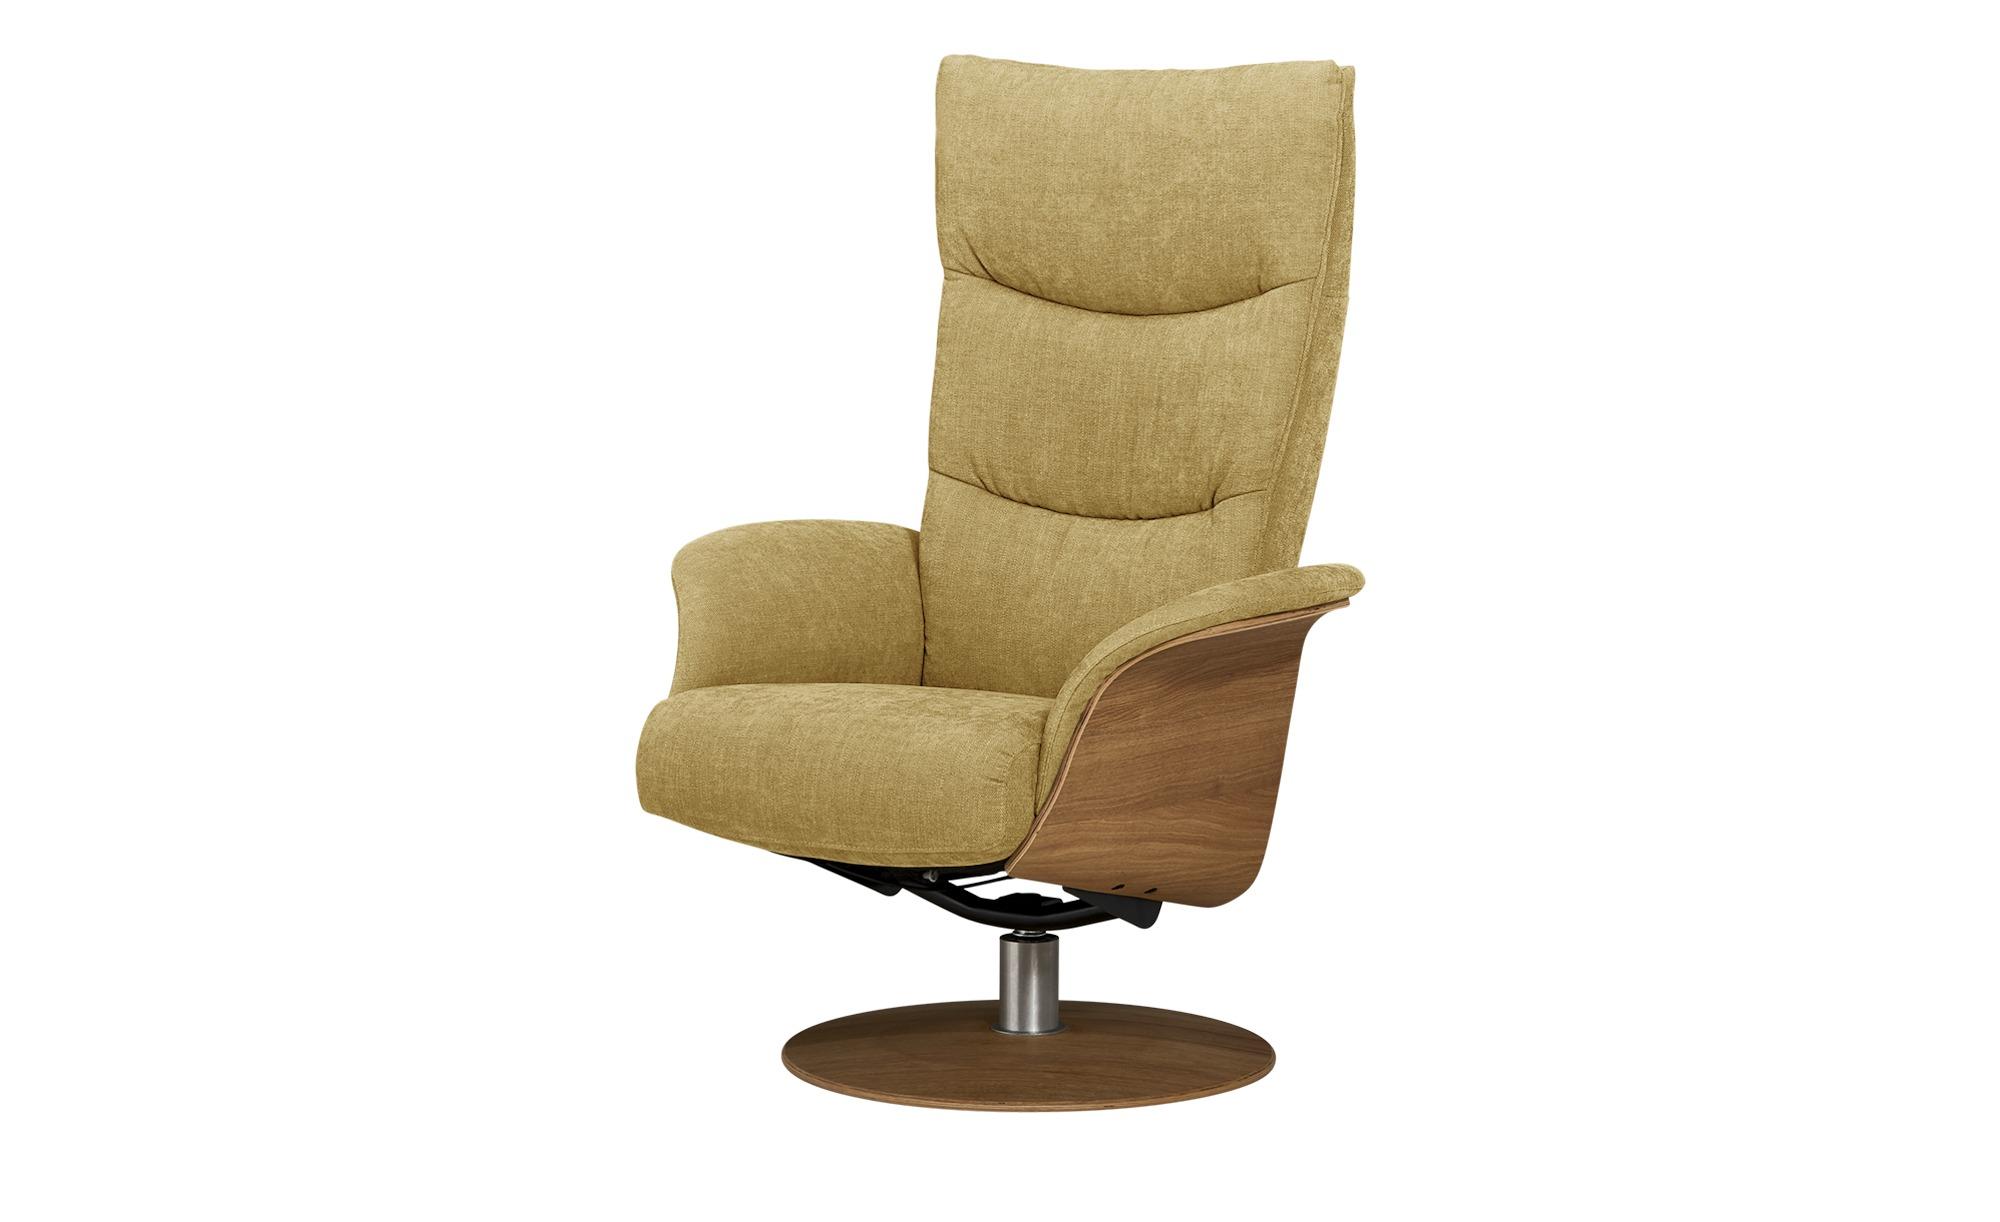 Nils Olsen Relaxsessel  Stian ¦ gelb ¦ Maße (cm): B: 77 H: 116 T: 82 Polstermöbel > Sessel > Fernsehsessel - Höffner